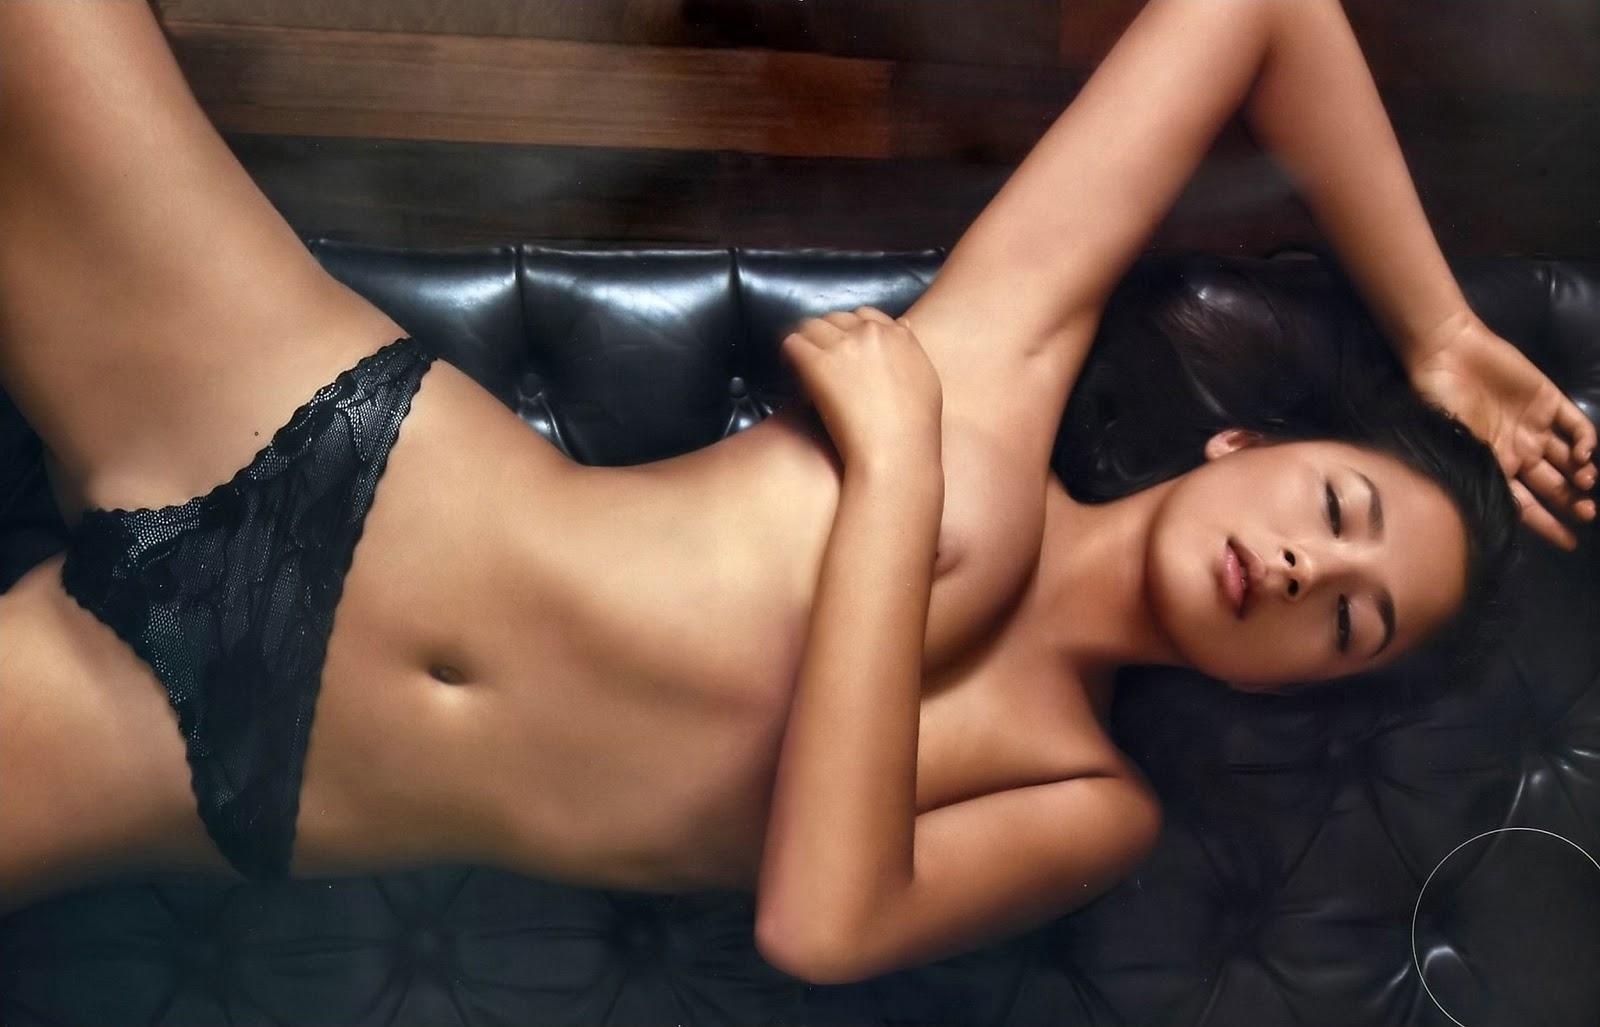 Jessica gomes naked shows boobs ass vagina